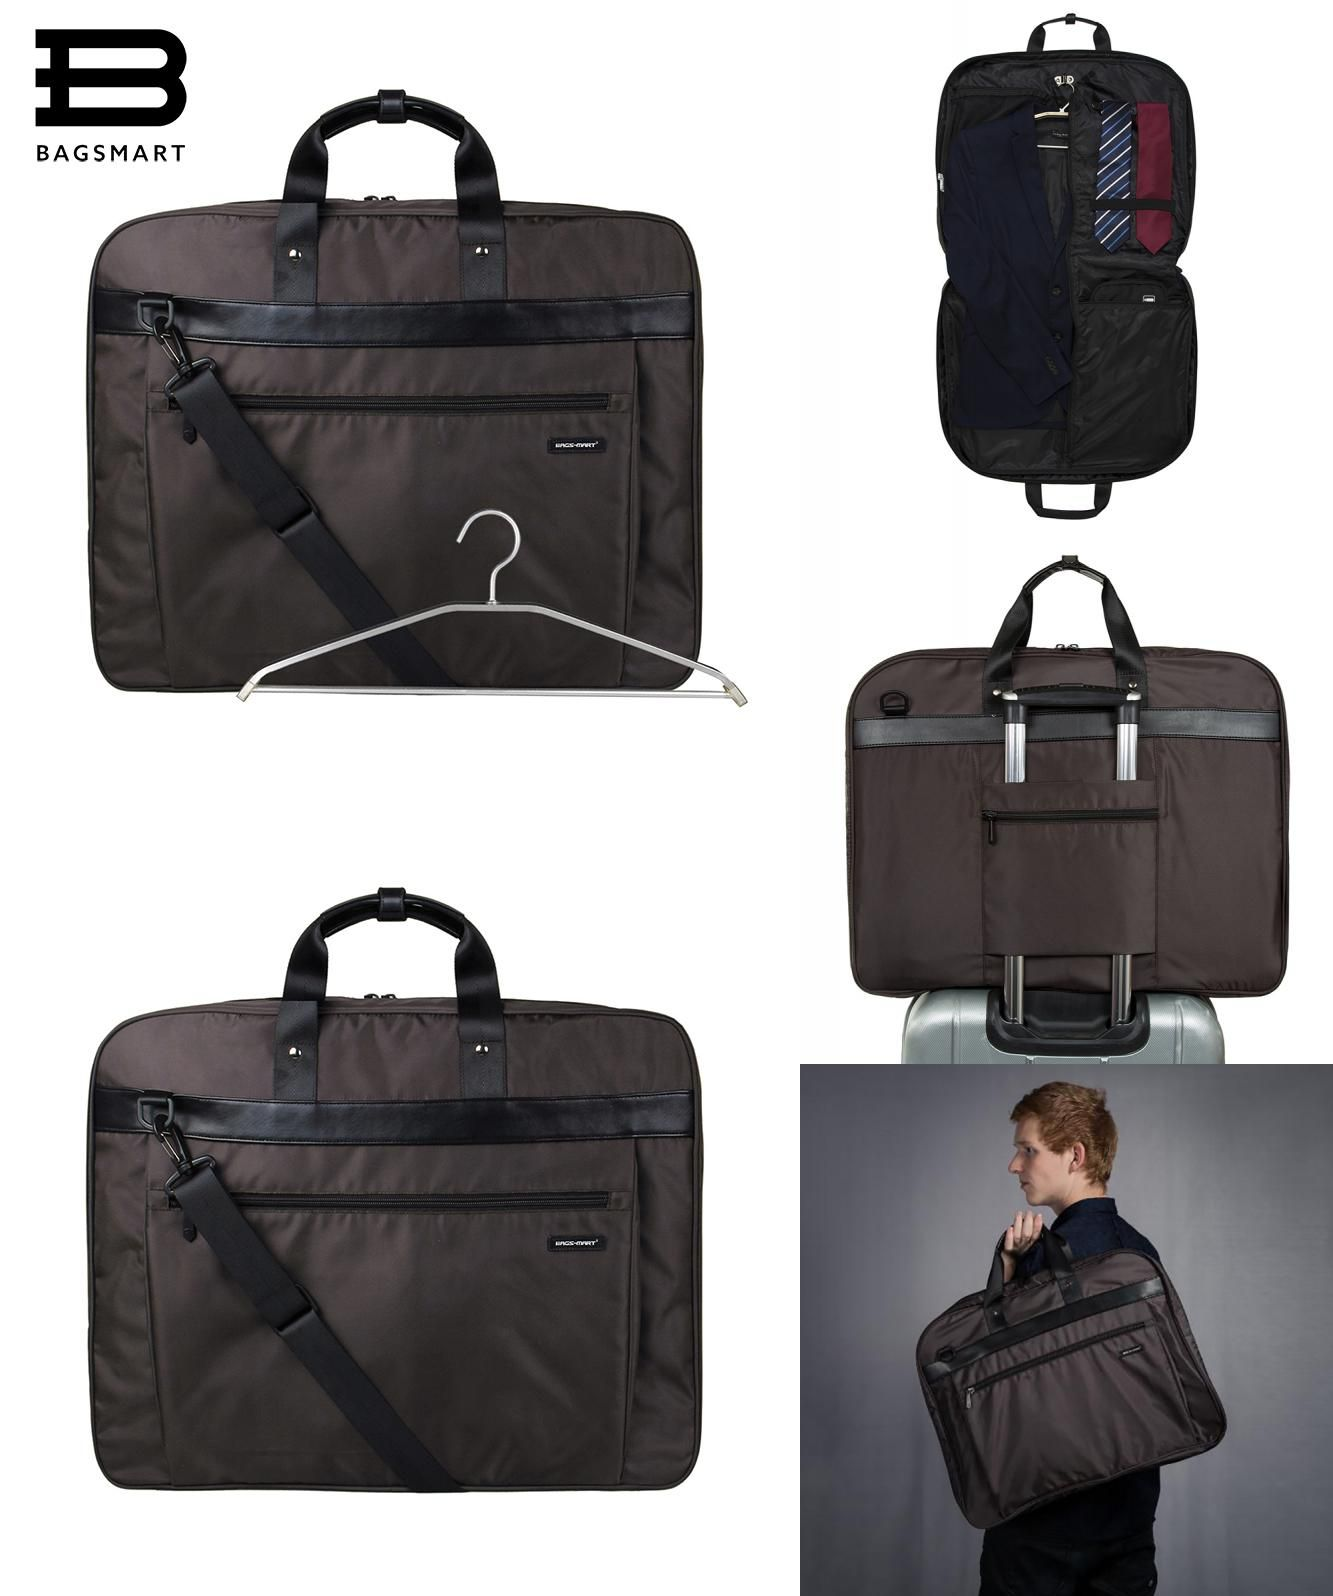 1c58bbeaa1  Visit to Buy  BAGSMART Lightweight Black Nylon Business Dress Garment Bag  With Handle Clamp